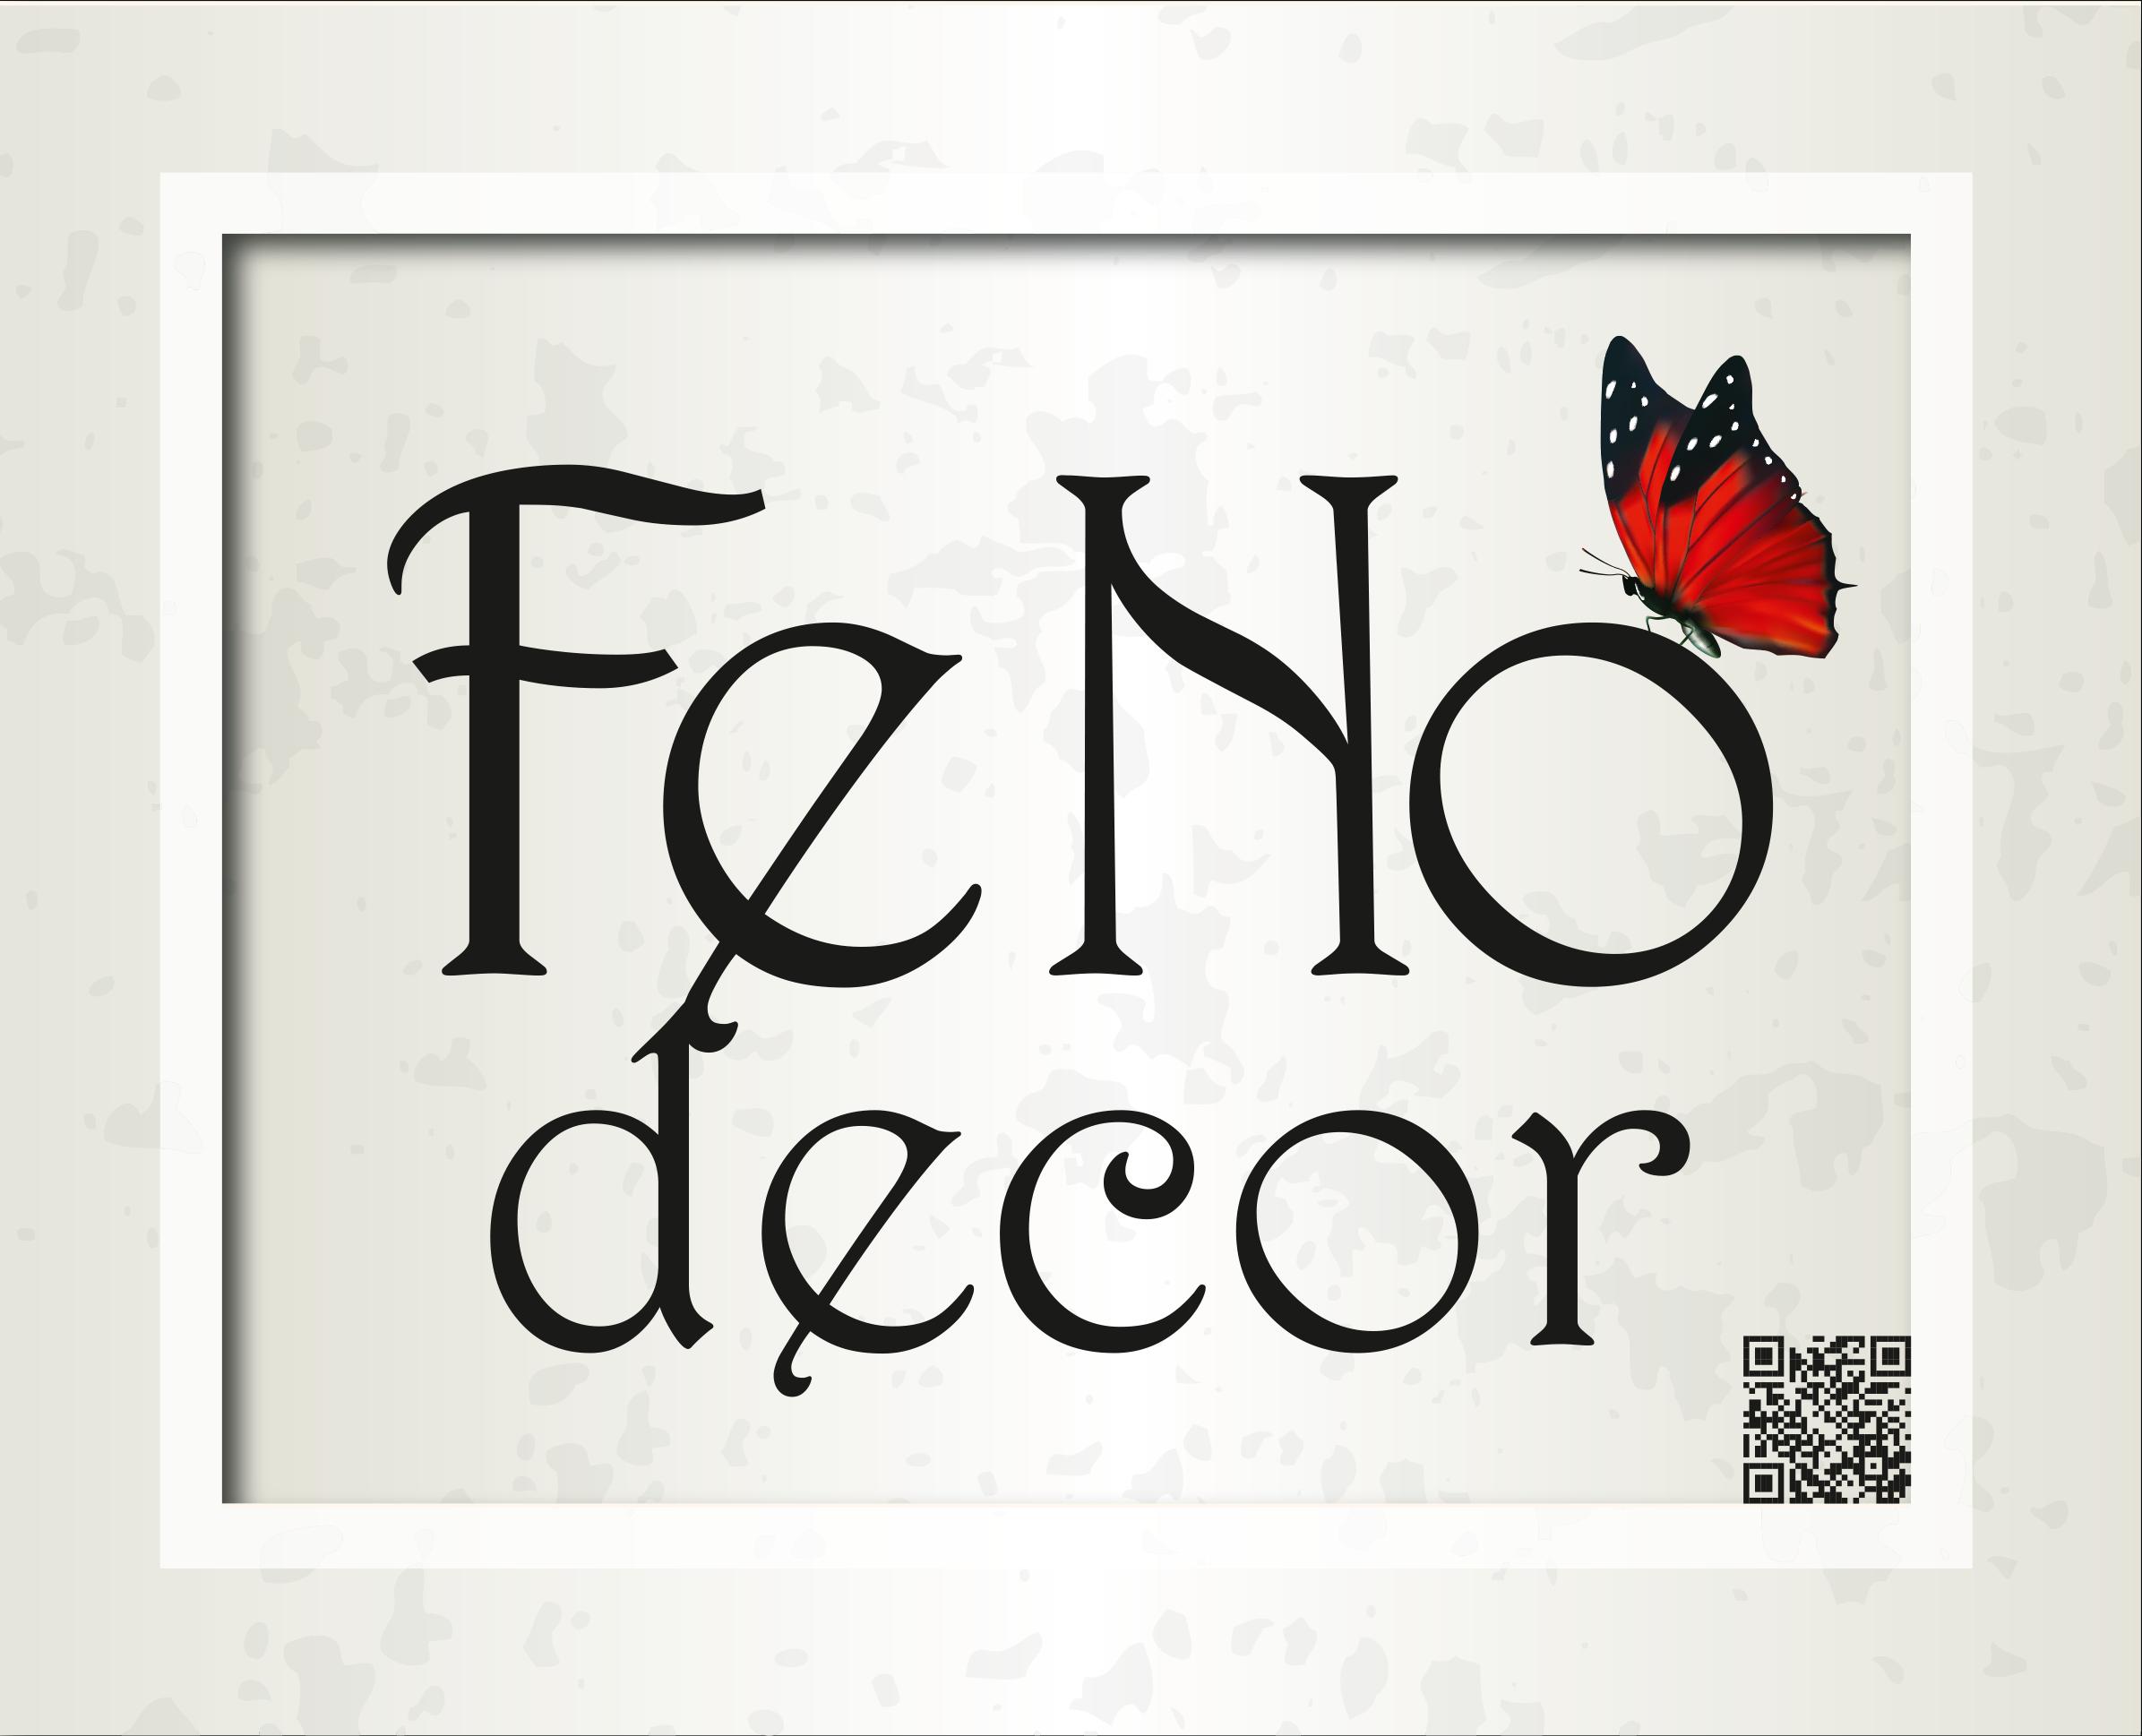 Fenodecor